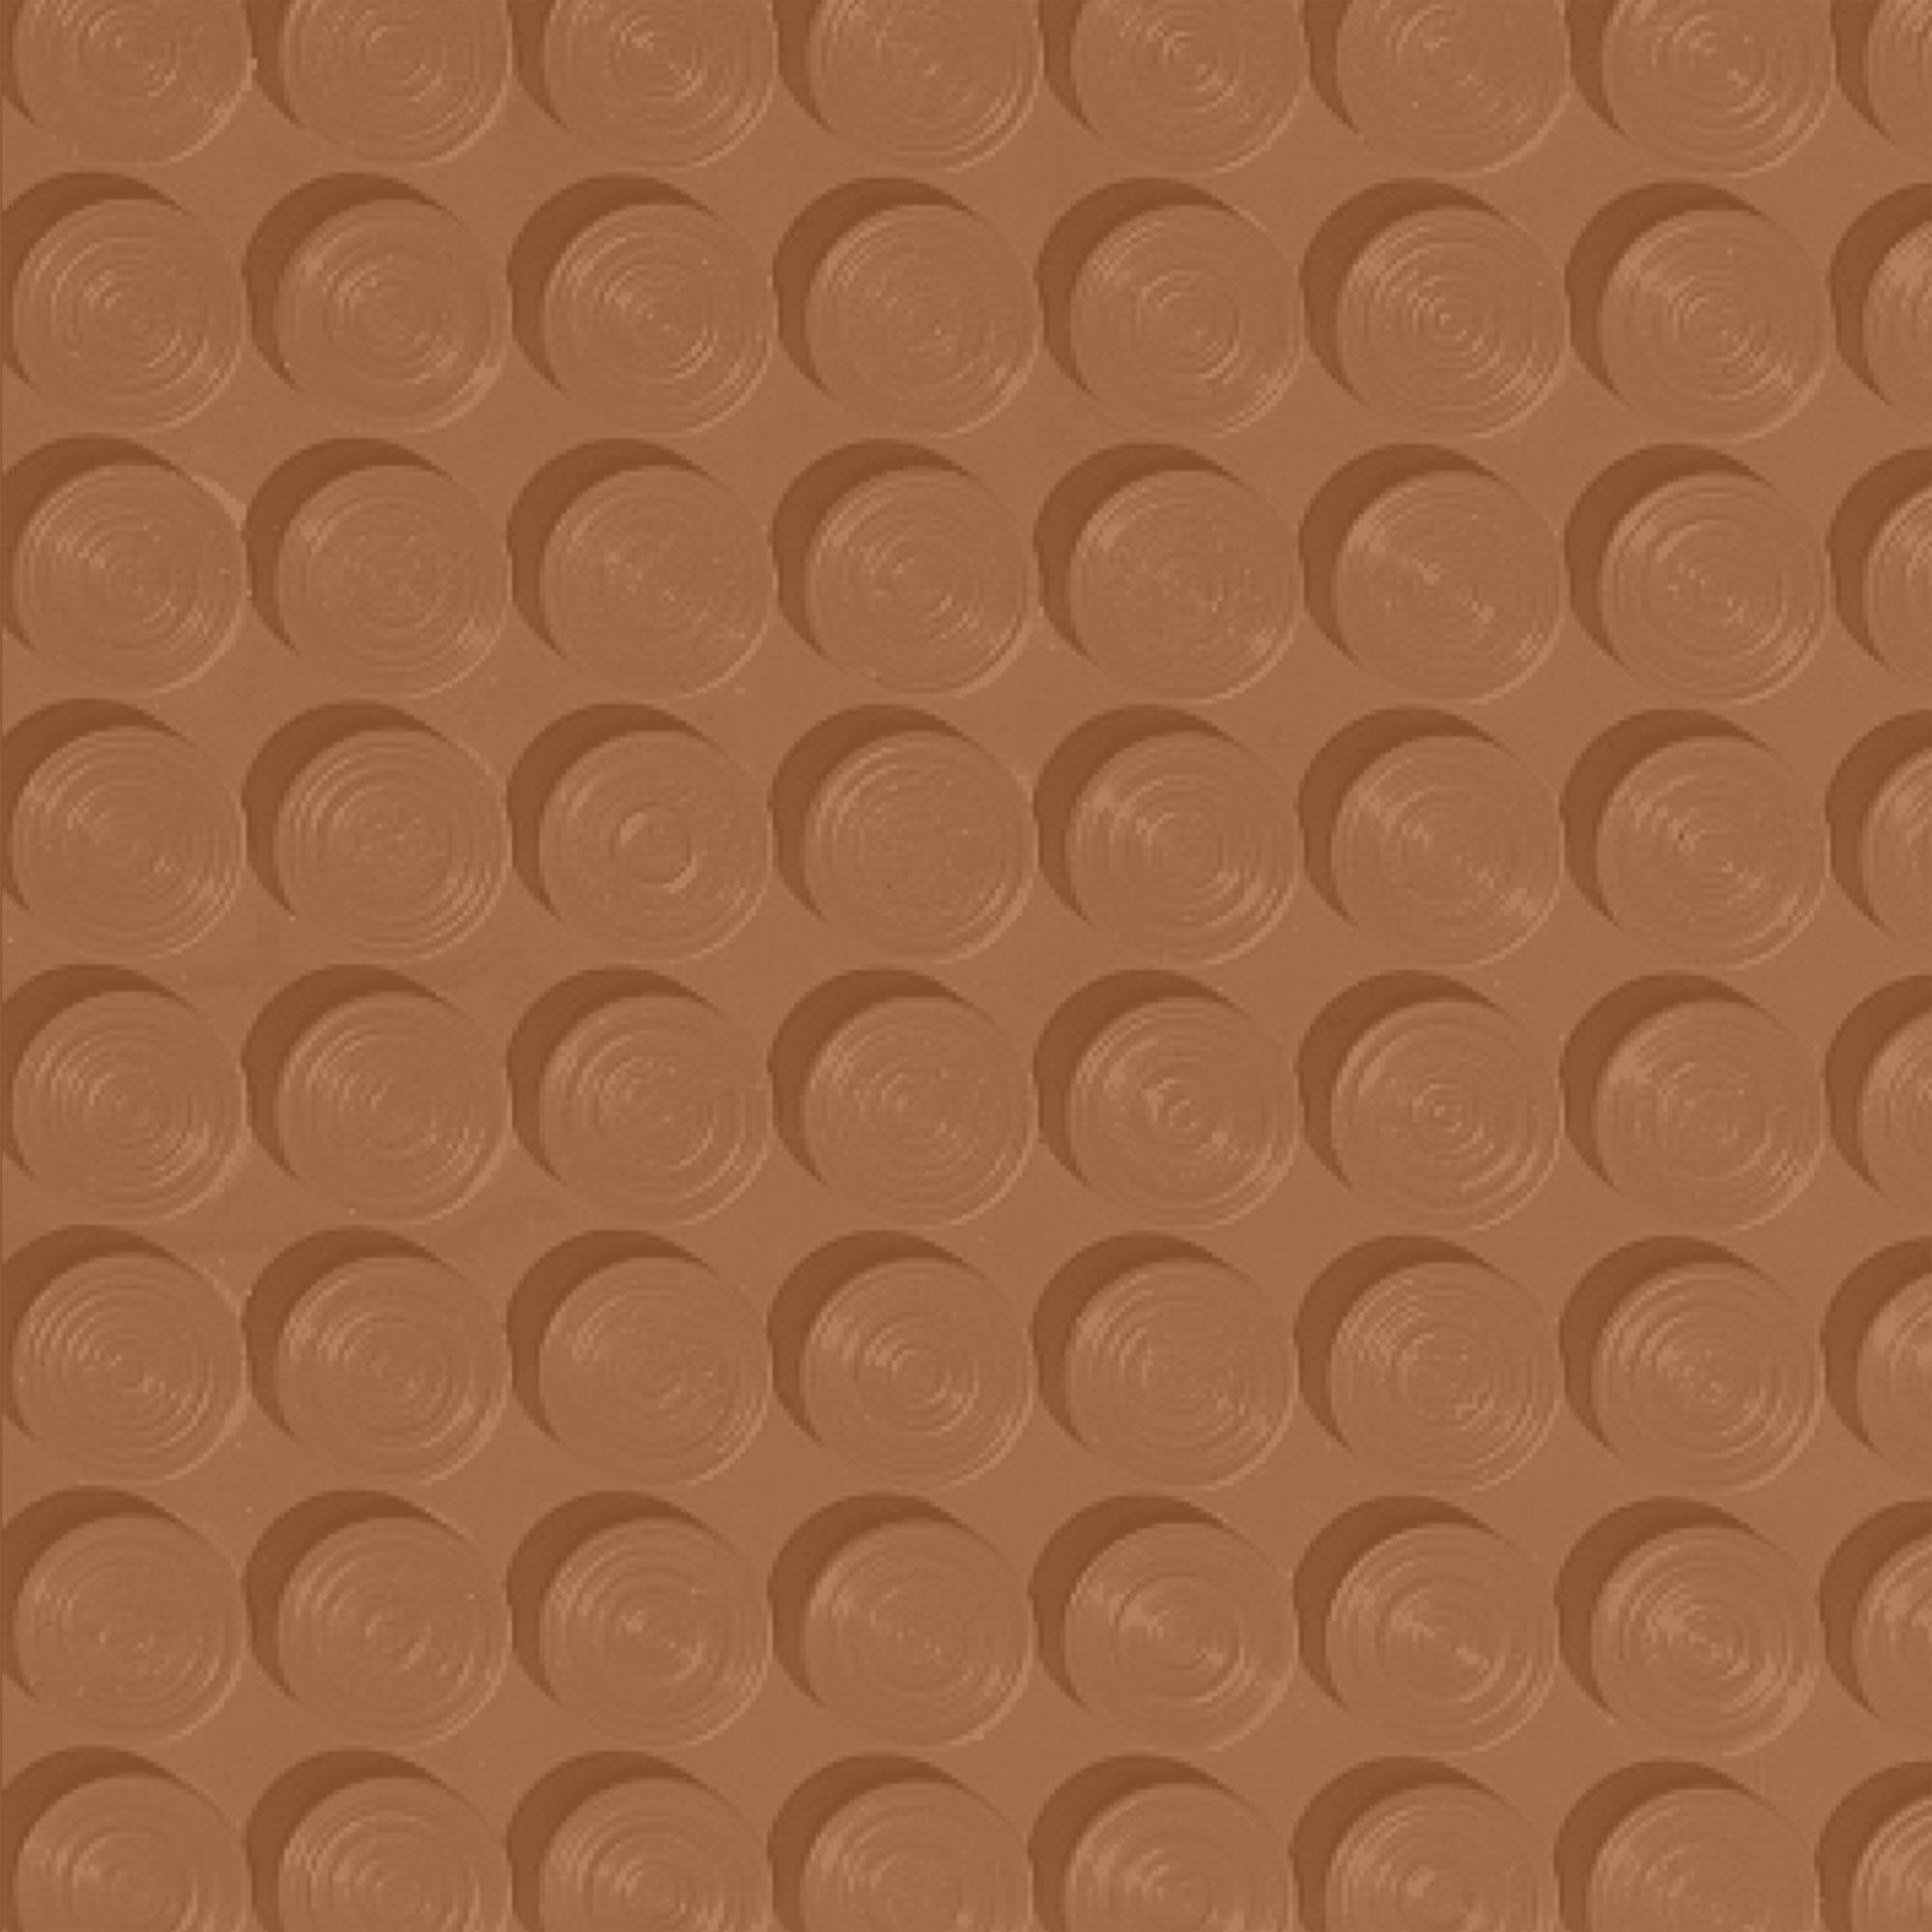 Roppe Rubber Tile 900 - Lug Back Vantage Design (LB996) Terracotta Rubber Flooring